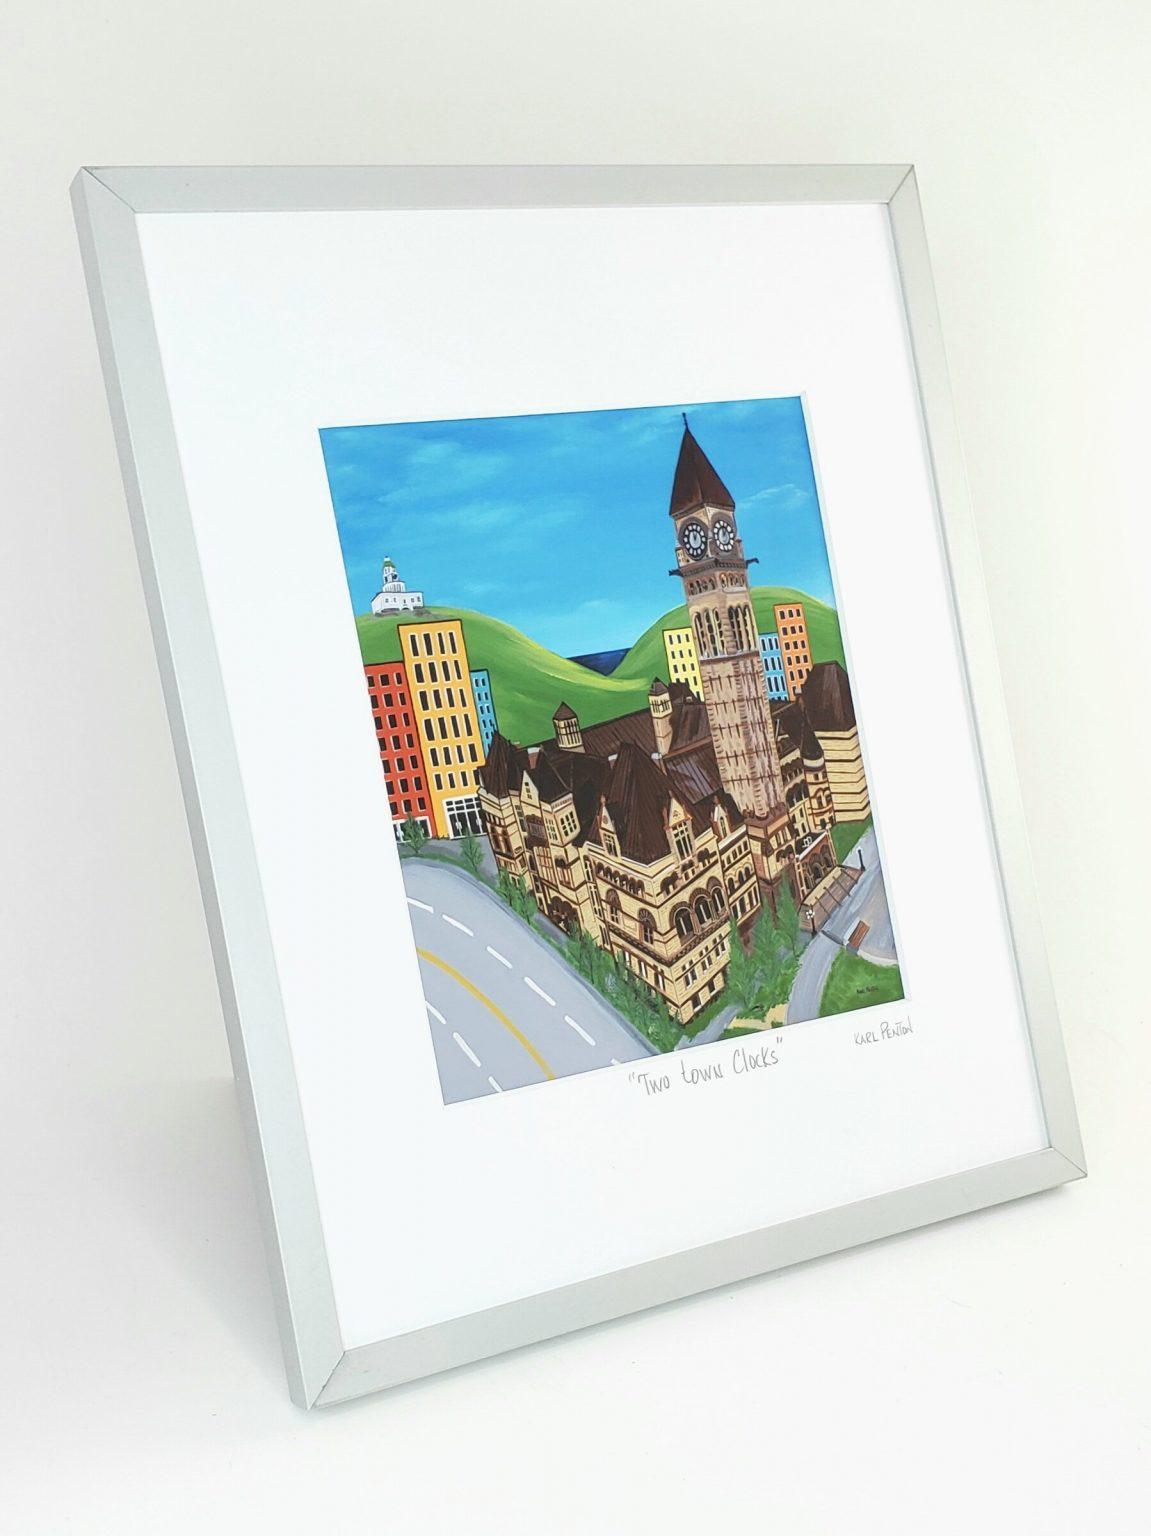 Two Town Clocks framed print by Karl Penton